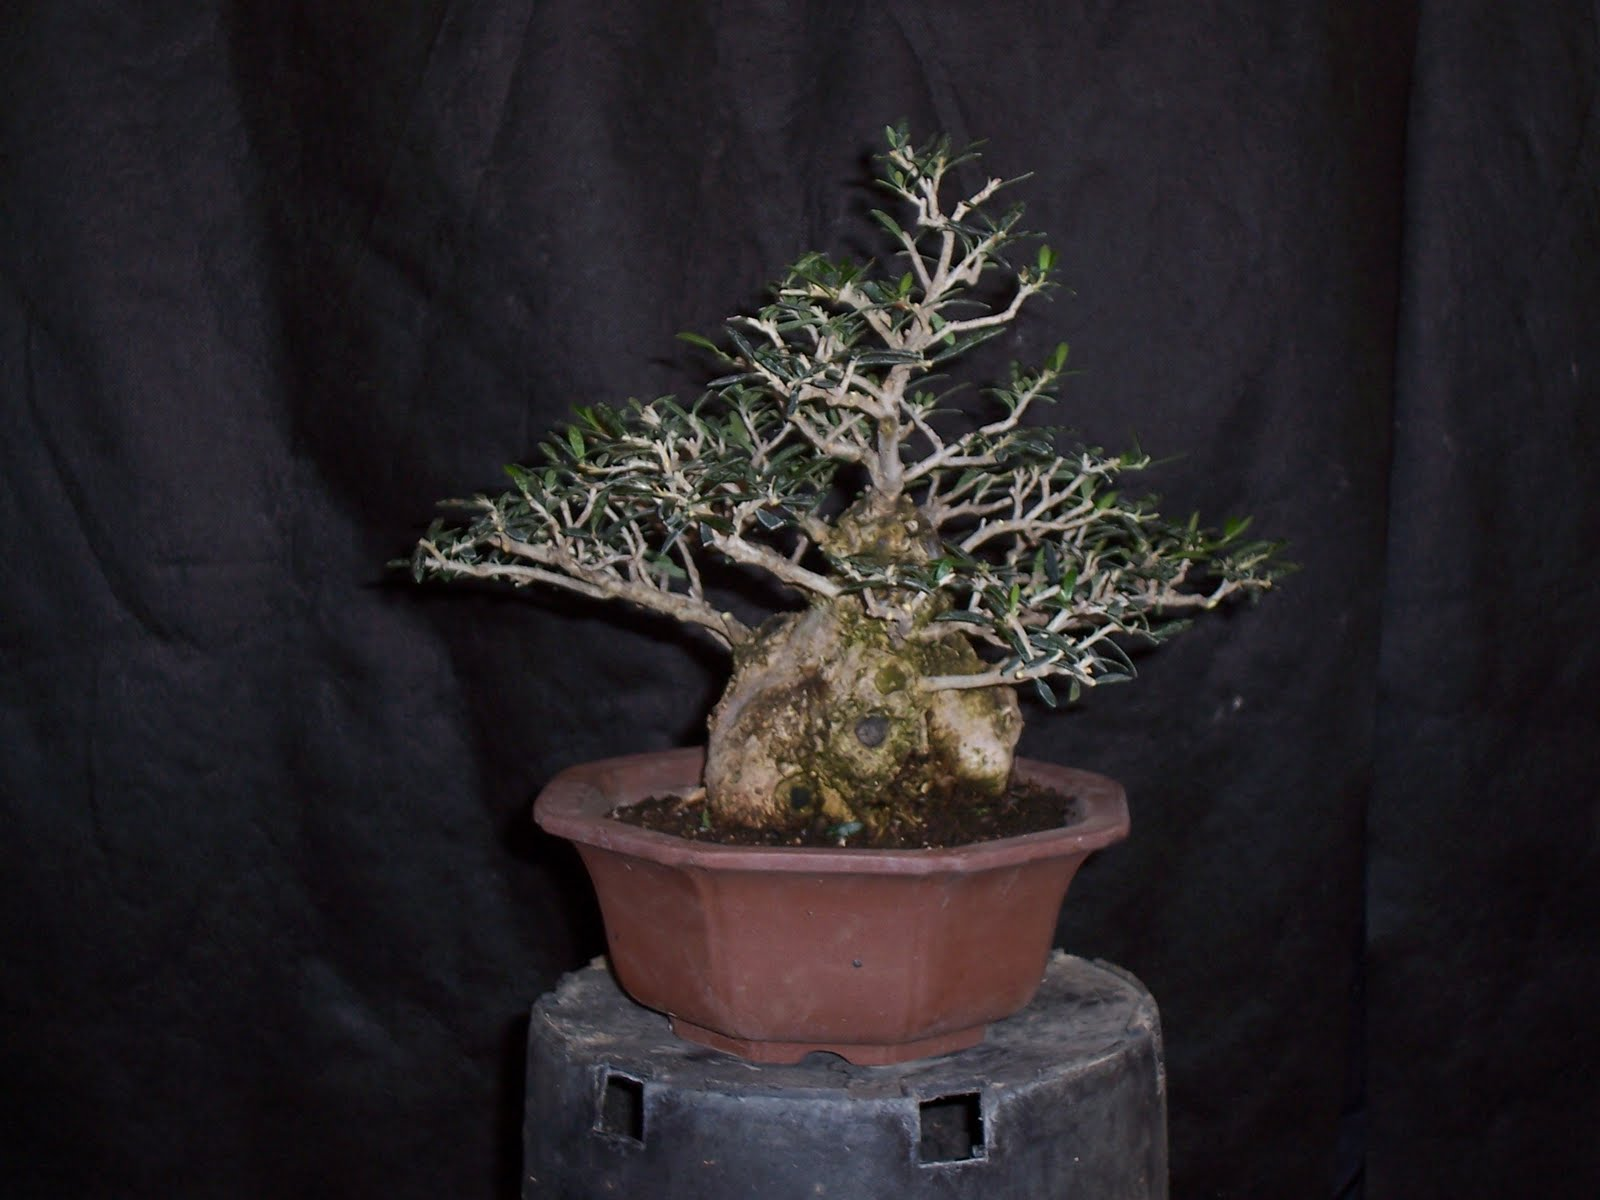 Bonsaibp39s Bonsai Blog Small Leaf Olives